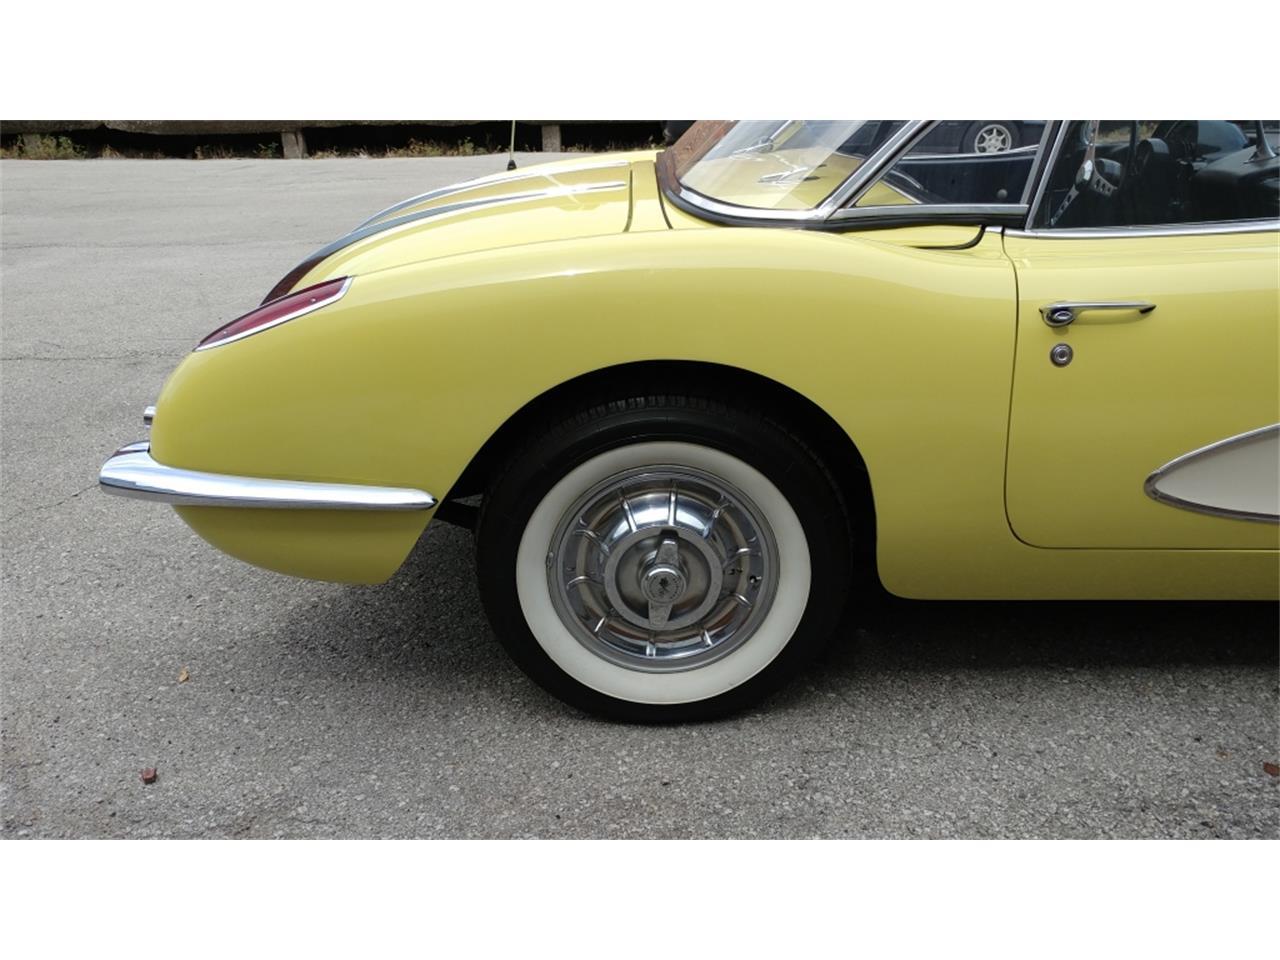 Large Picture of Classic '58 Chevrolet Corvette - $75,999.00 - MO26